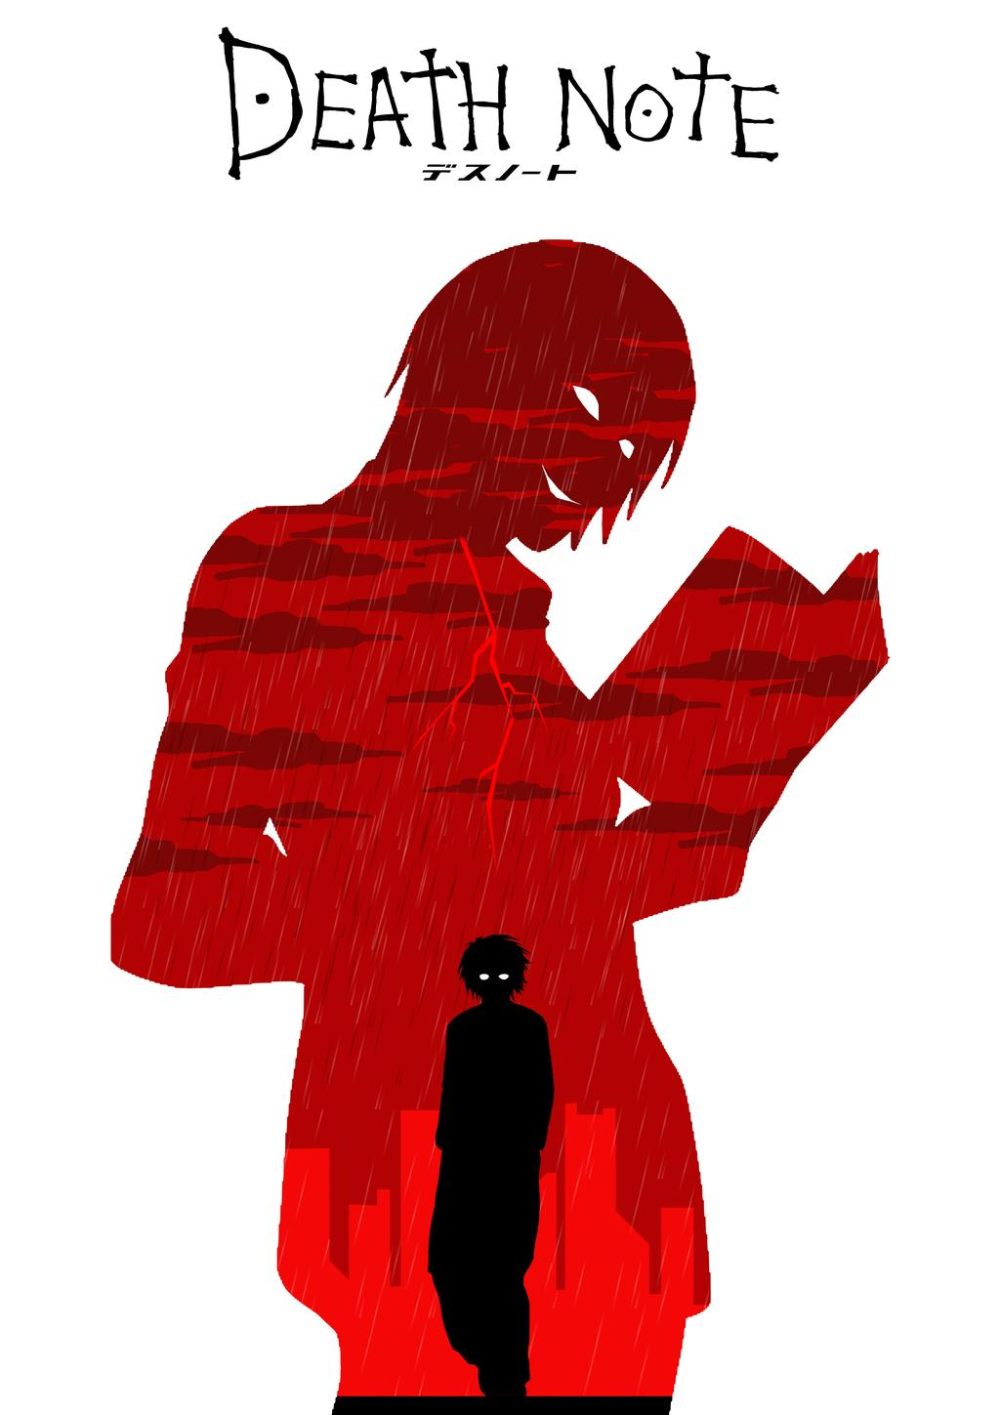 Death Note Poster 3 by Itachi-G on DeviantArt